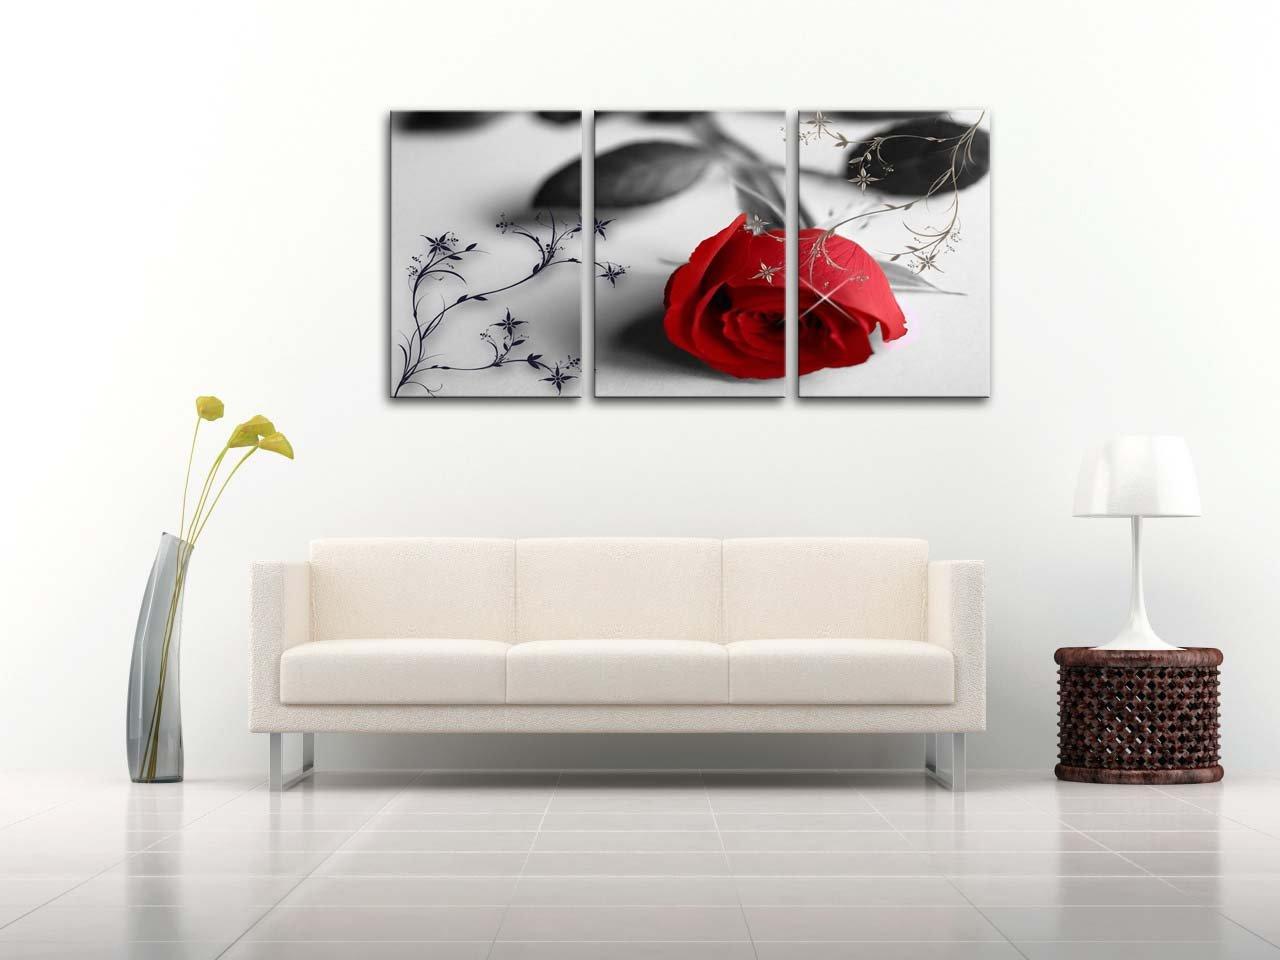 Amazon.com: Canvas Print Wall Art Painting For Home Decor Still Life ...